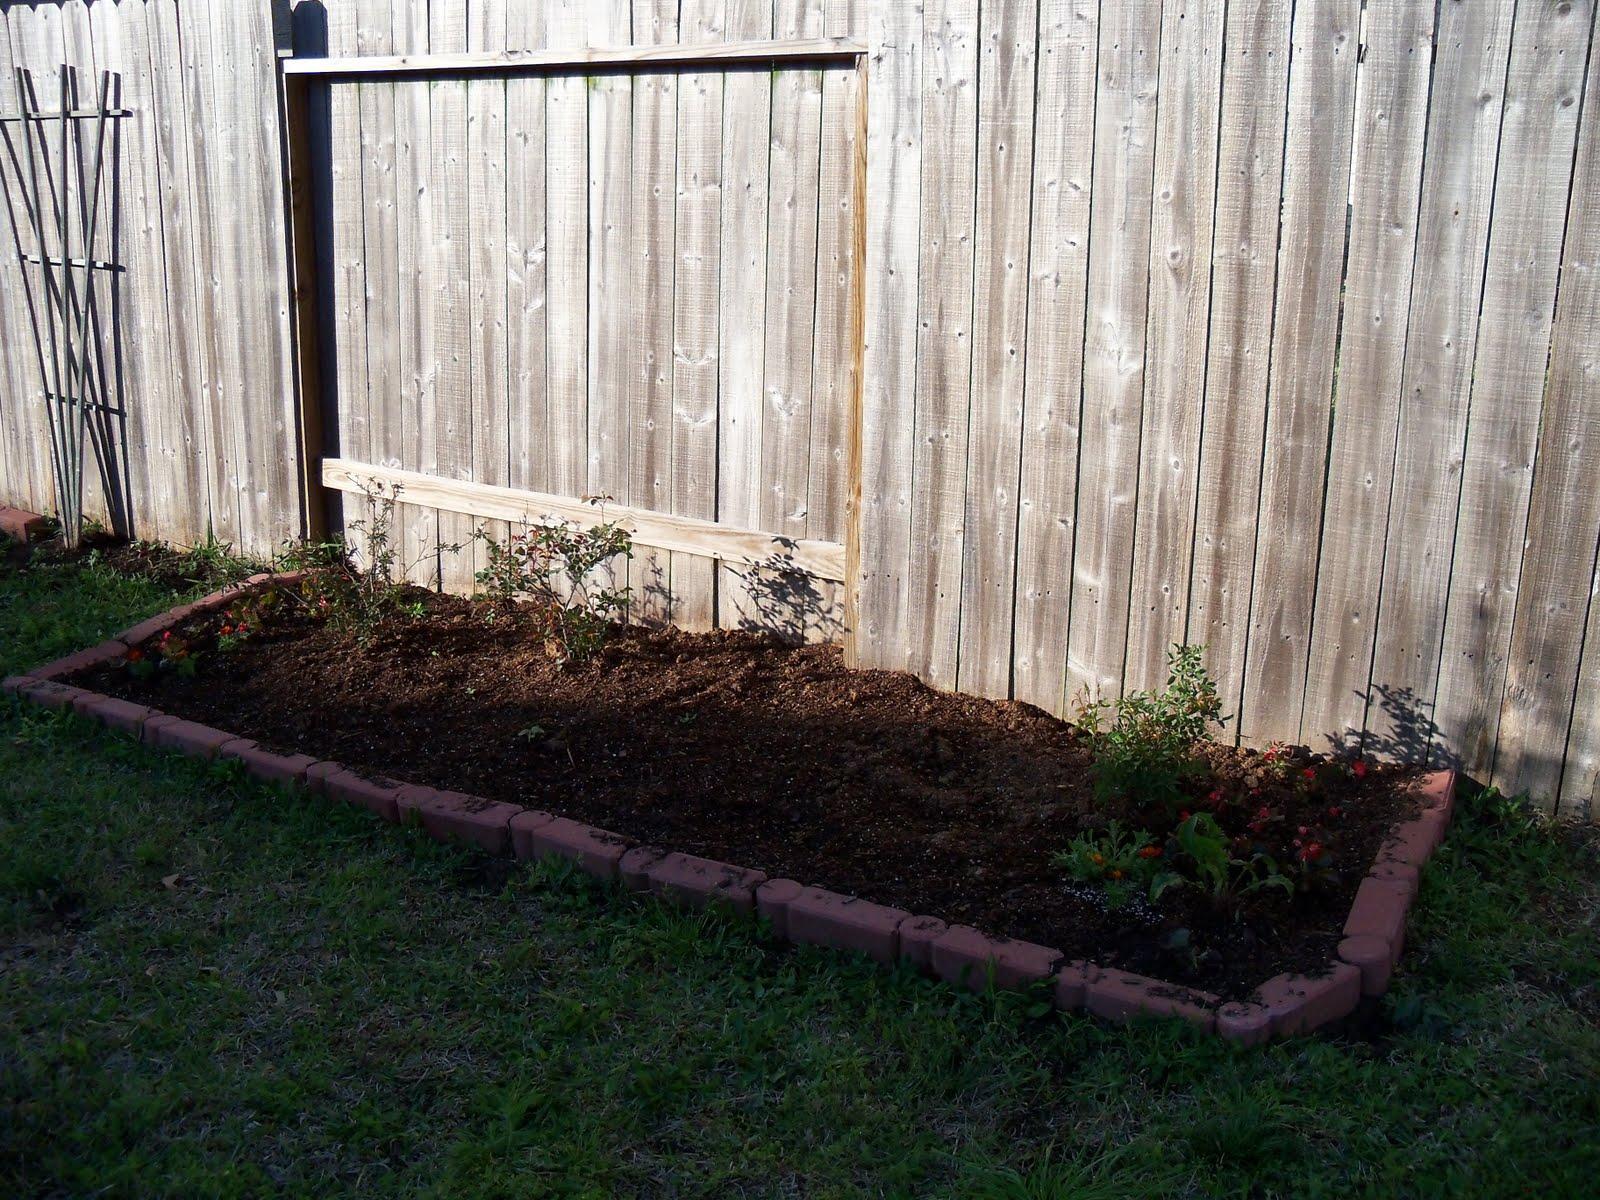 Gardening 2010 - 101_0284.JPG